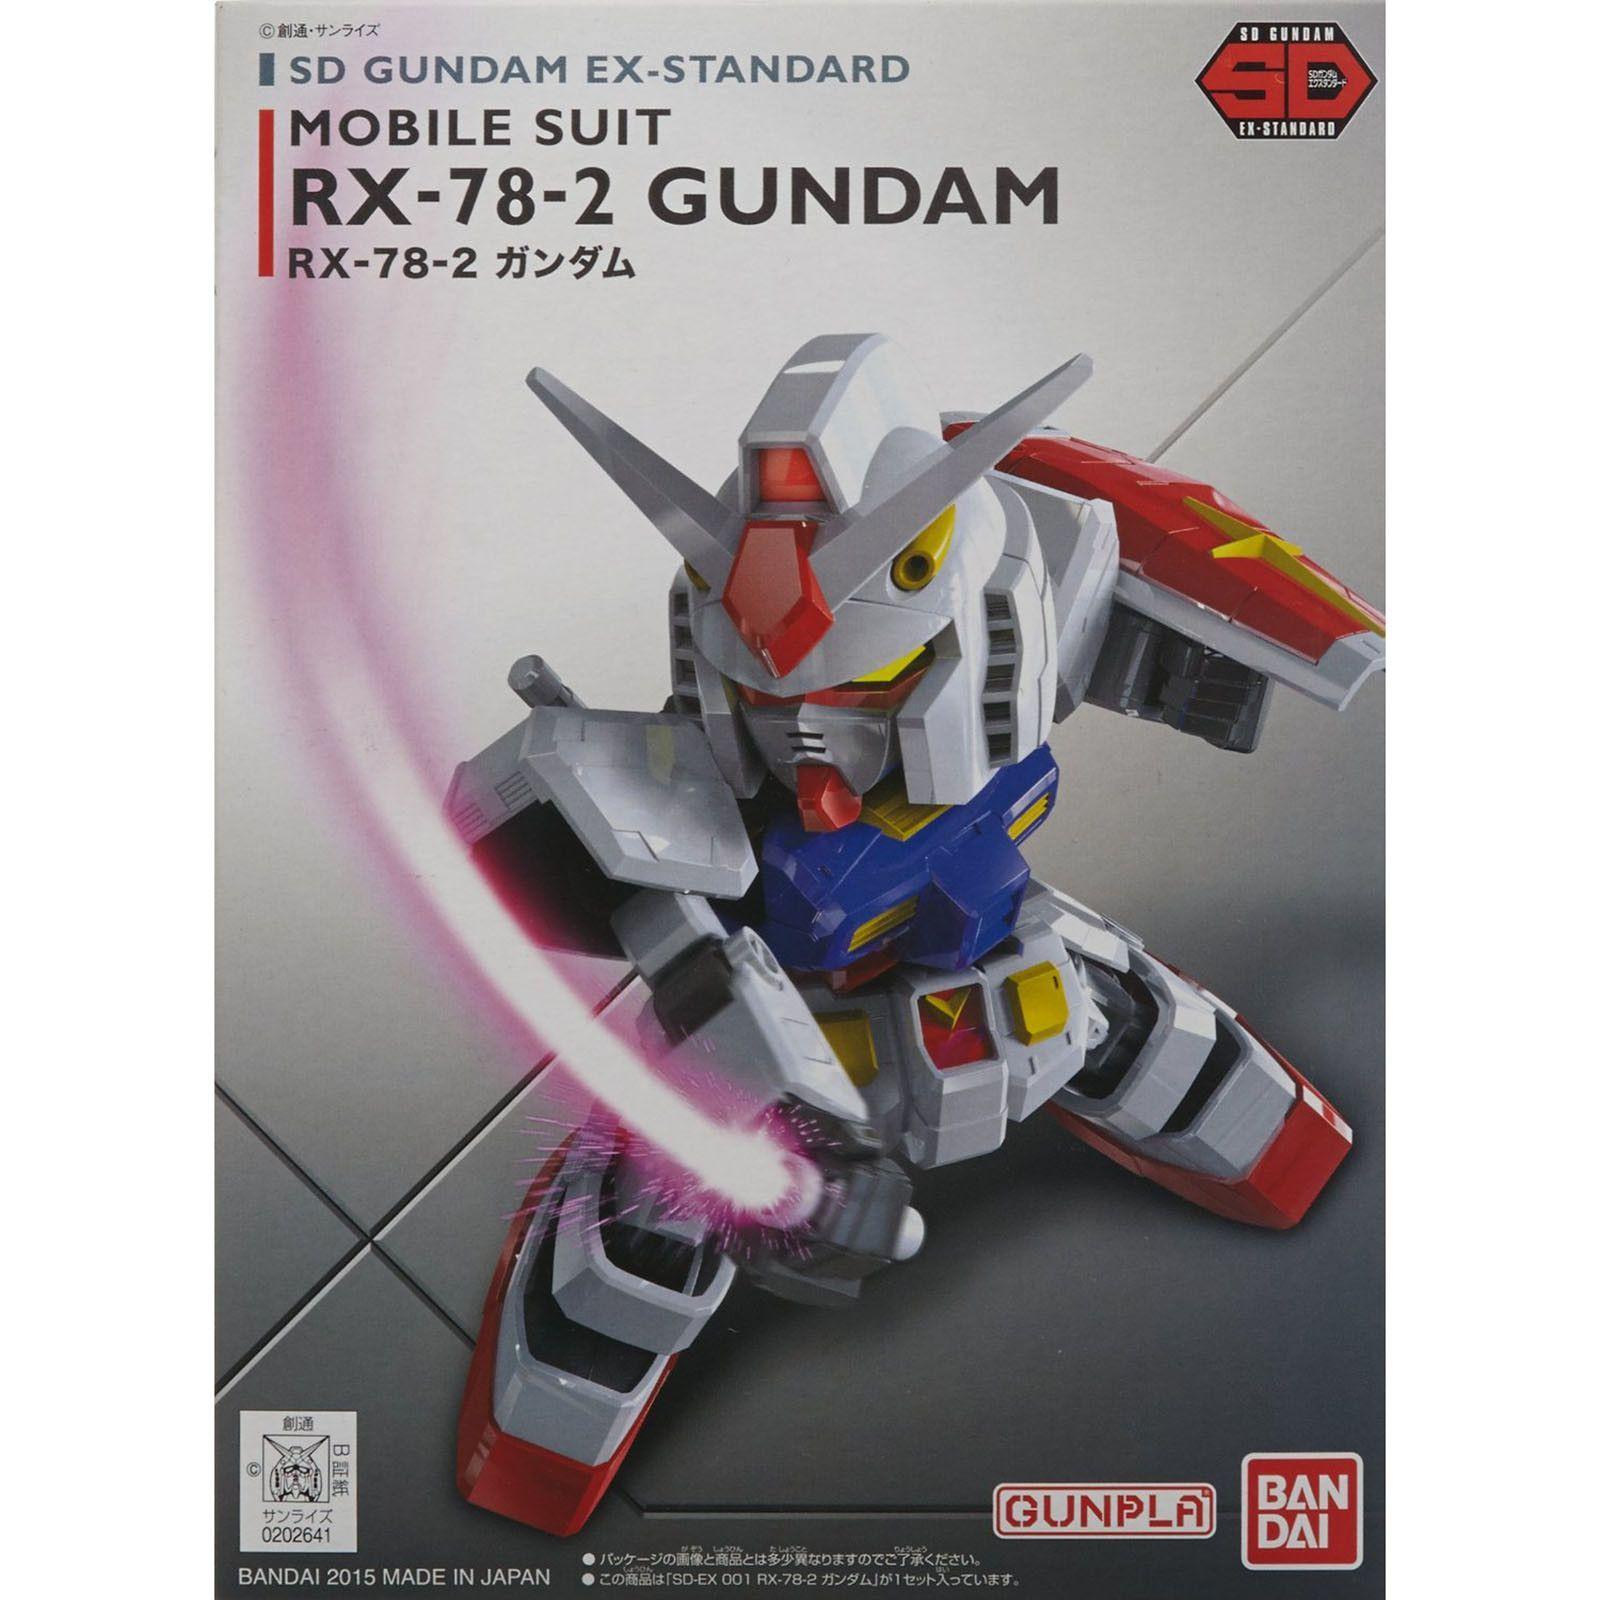 Bandai Gundam Mobile Suit Series 2 Blind Box Mini Figure New Collectibles